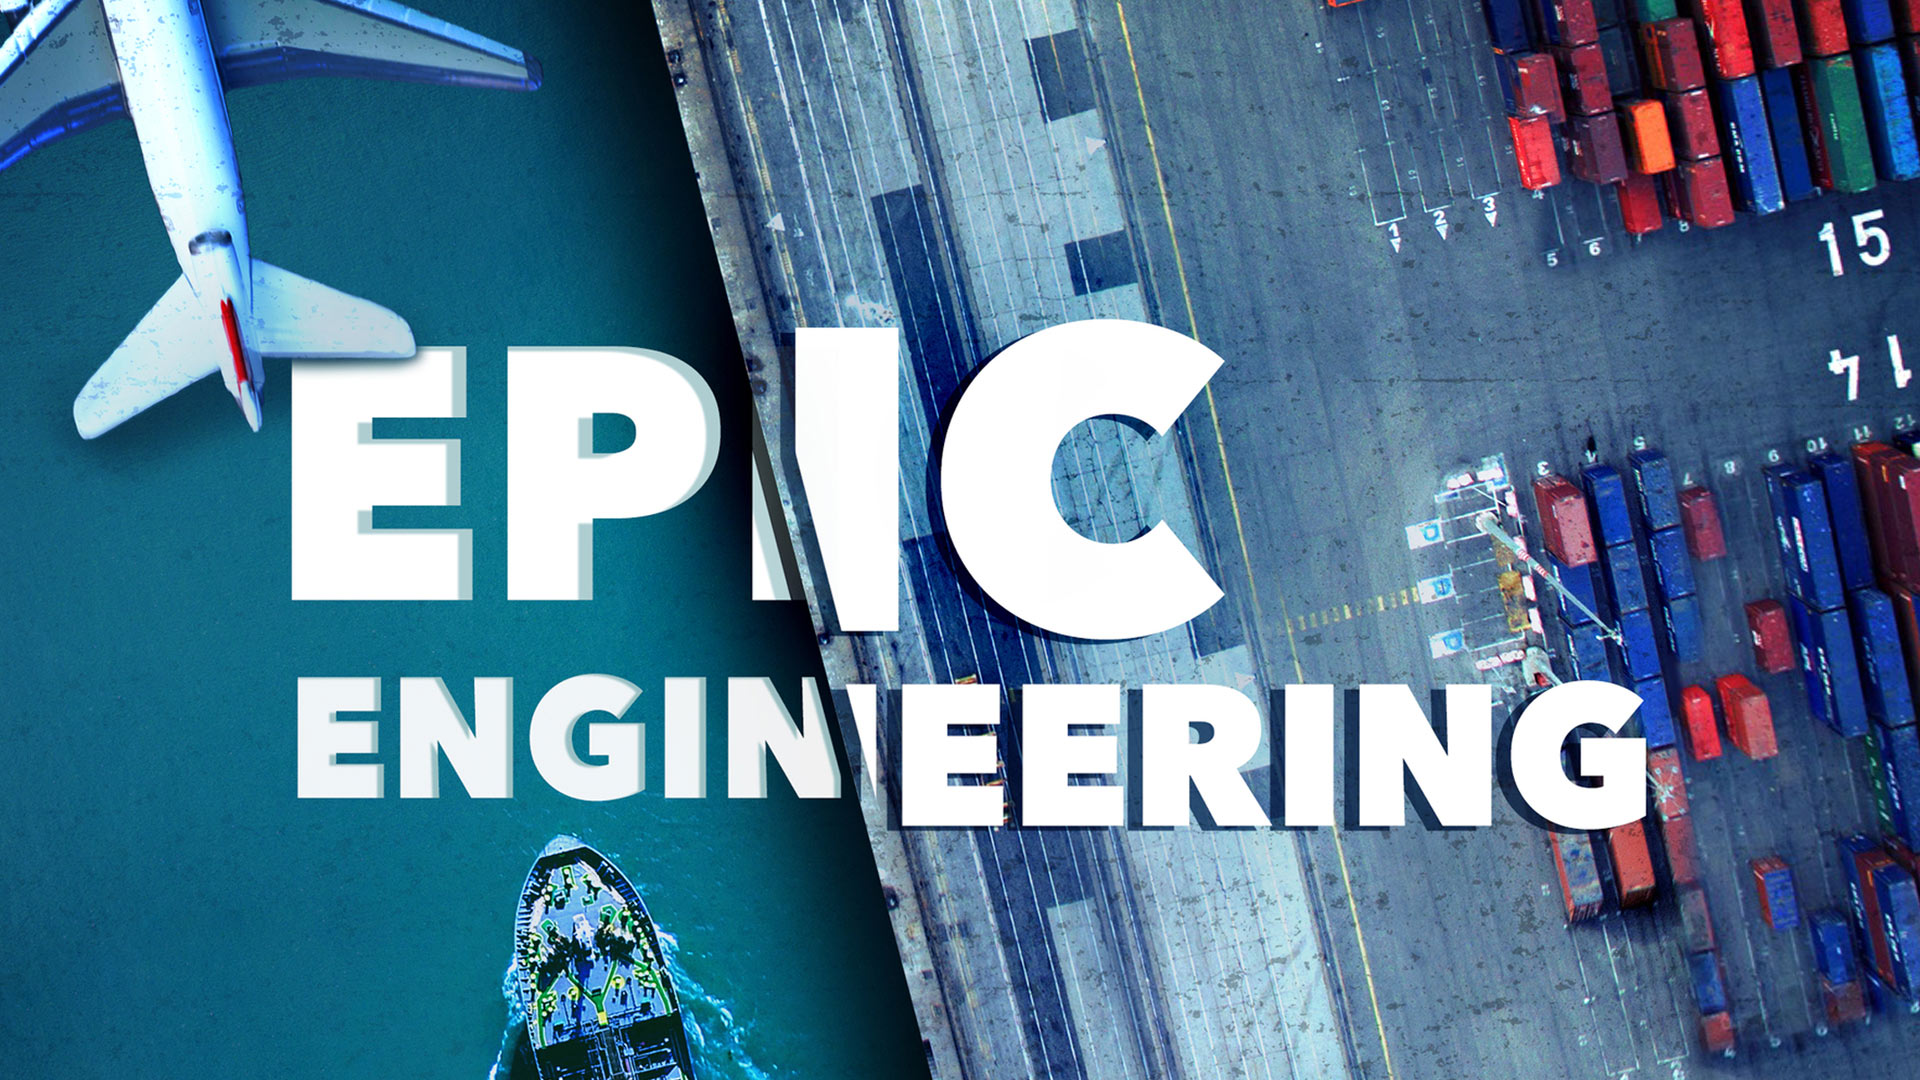 Epic Engineering - Season 1